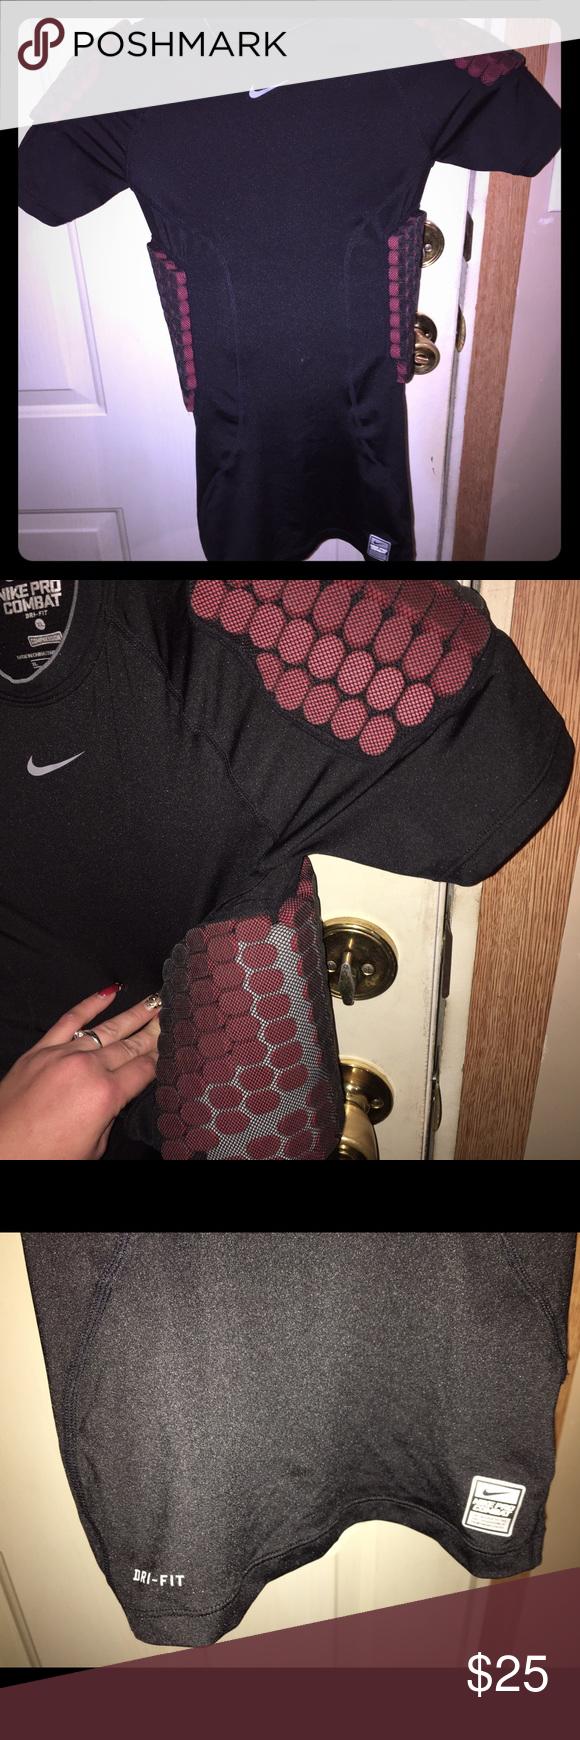 🏃Nike Combat Padded Football Shirt🏃 NWOT Boys Under Armor Padded compression Shirt Nike Other